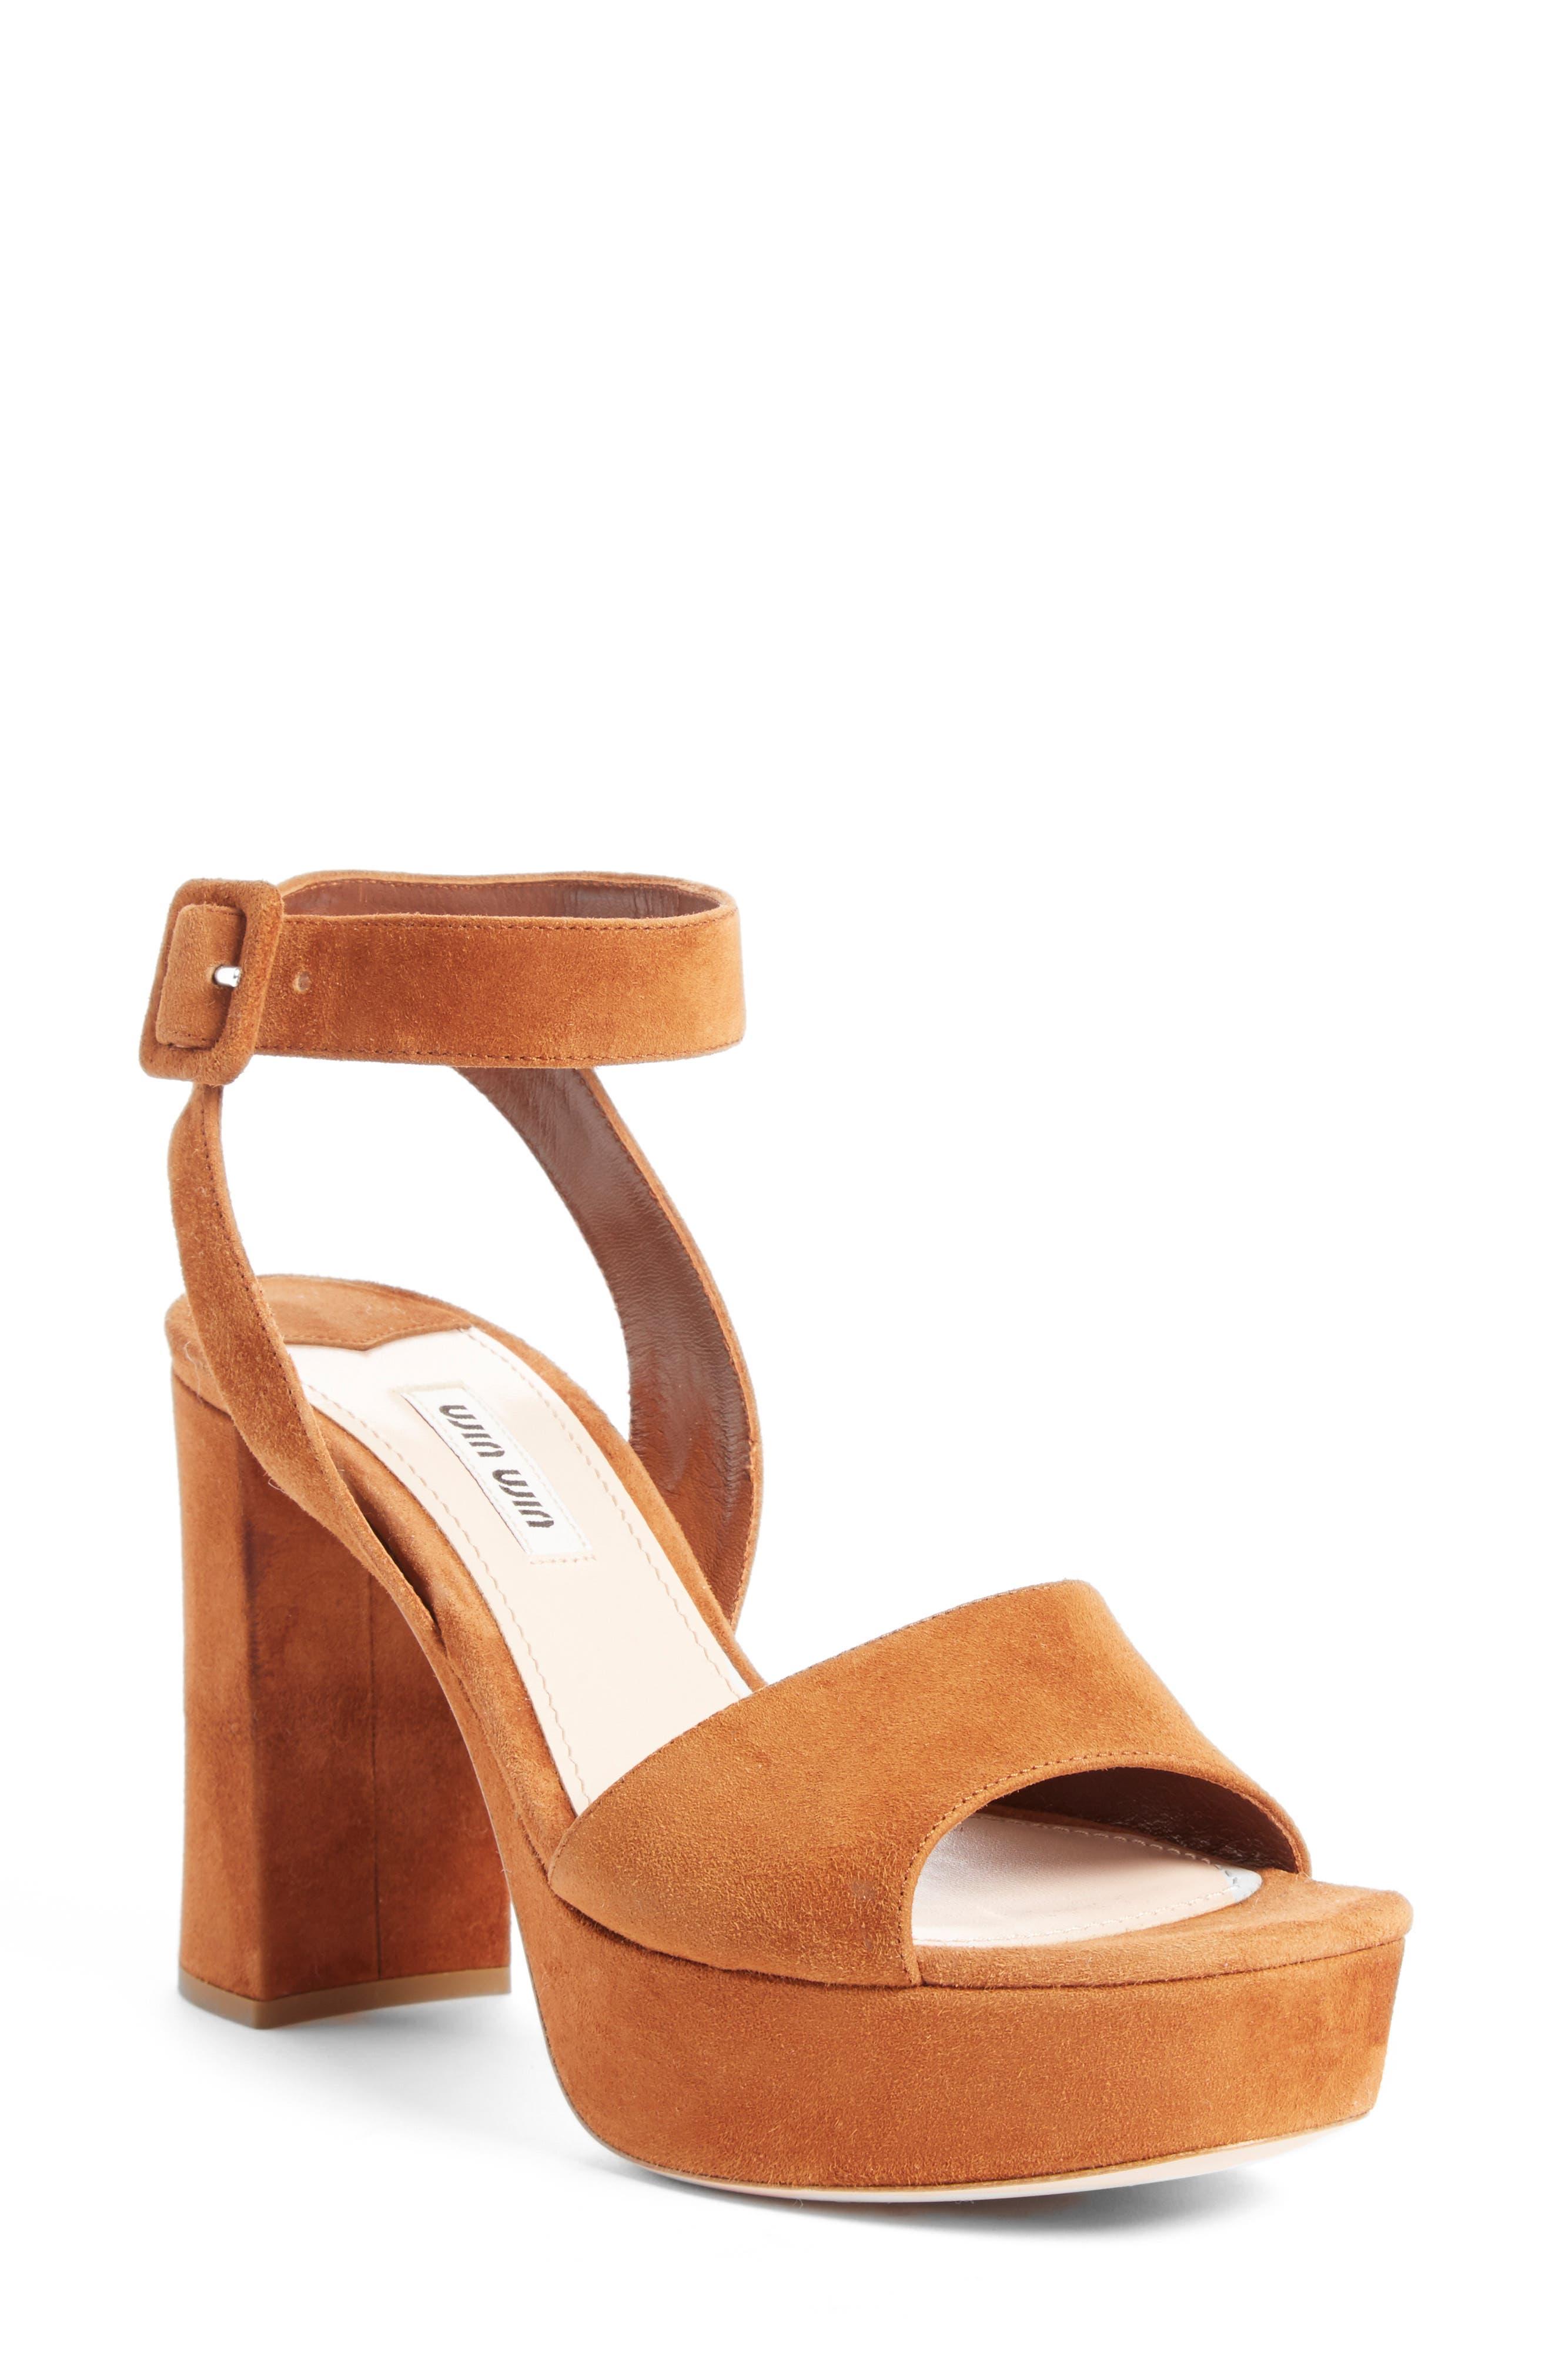 'Sandali' Ankle Strap Sandal,                             Alternate thumbnail 9, color,